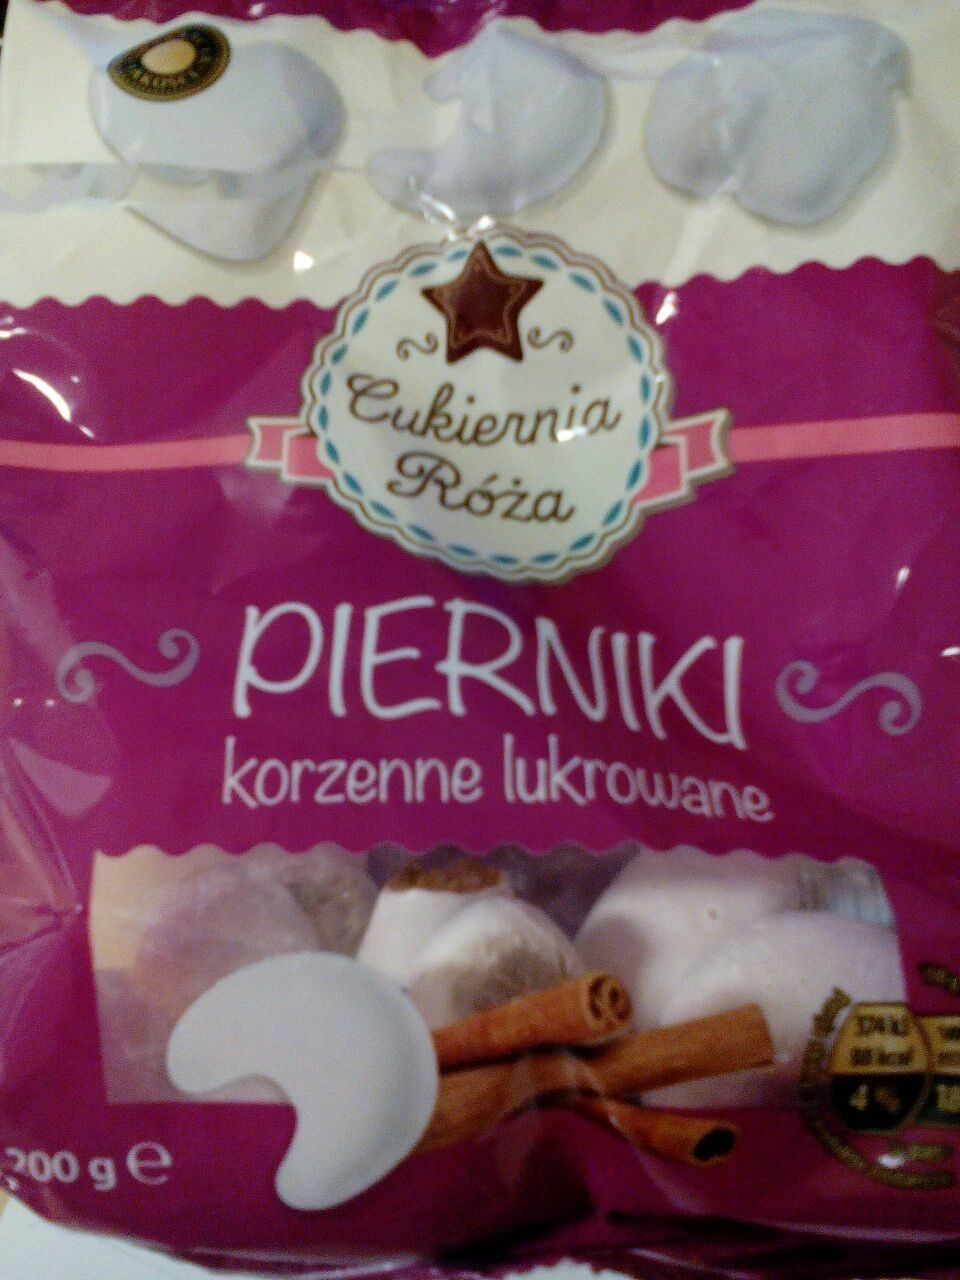 Pierniki - Product - ru